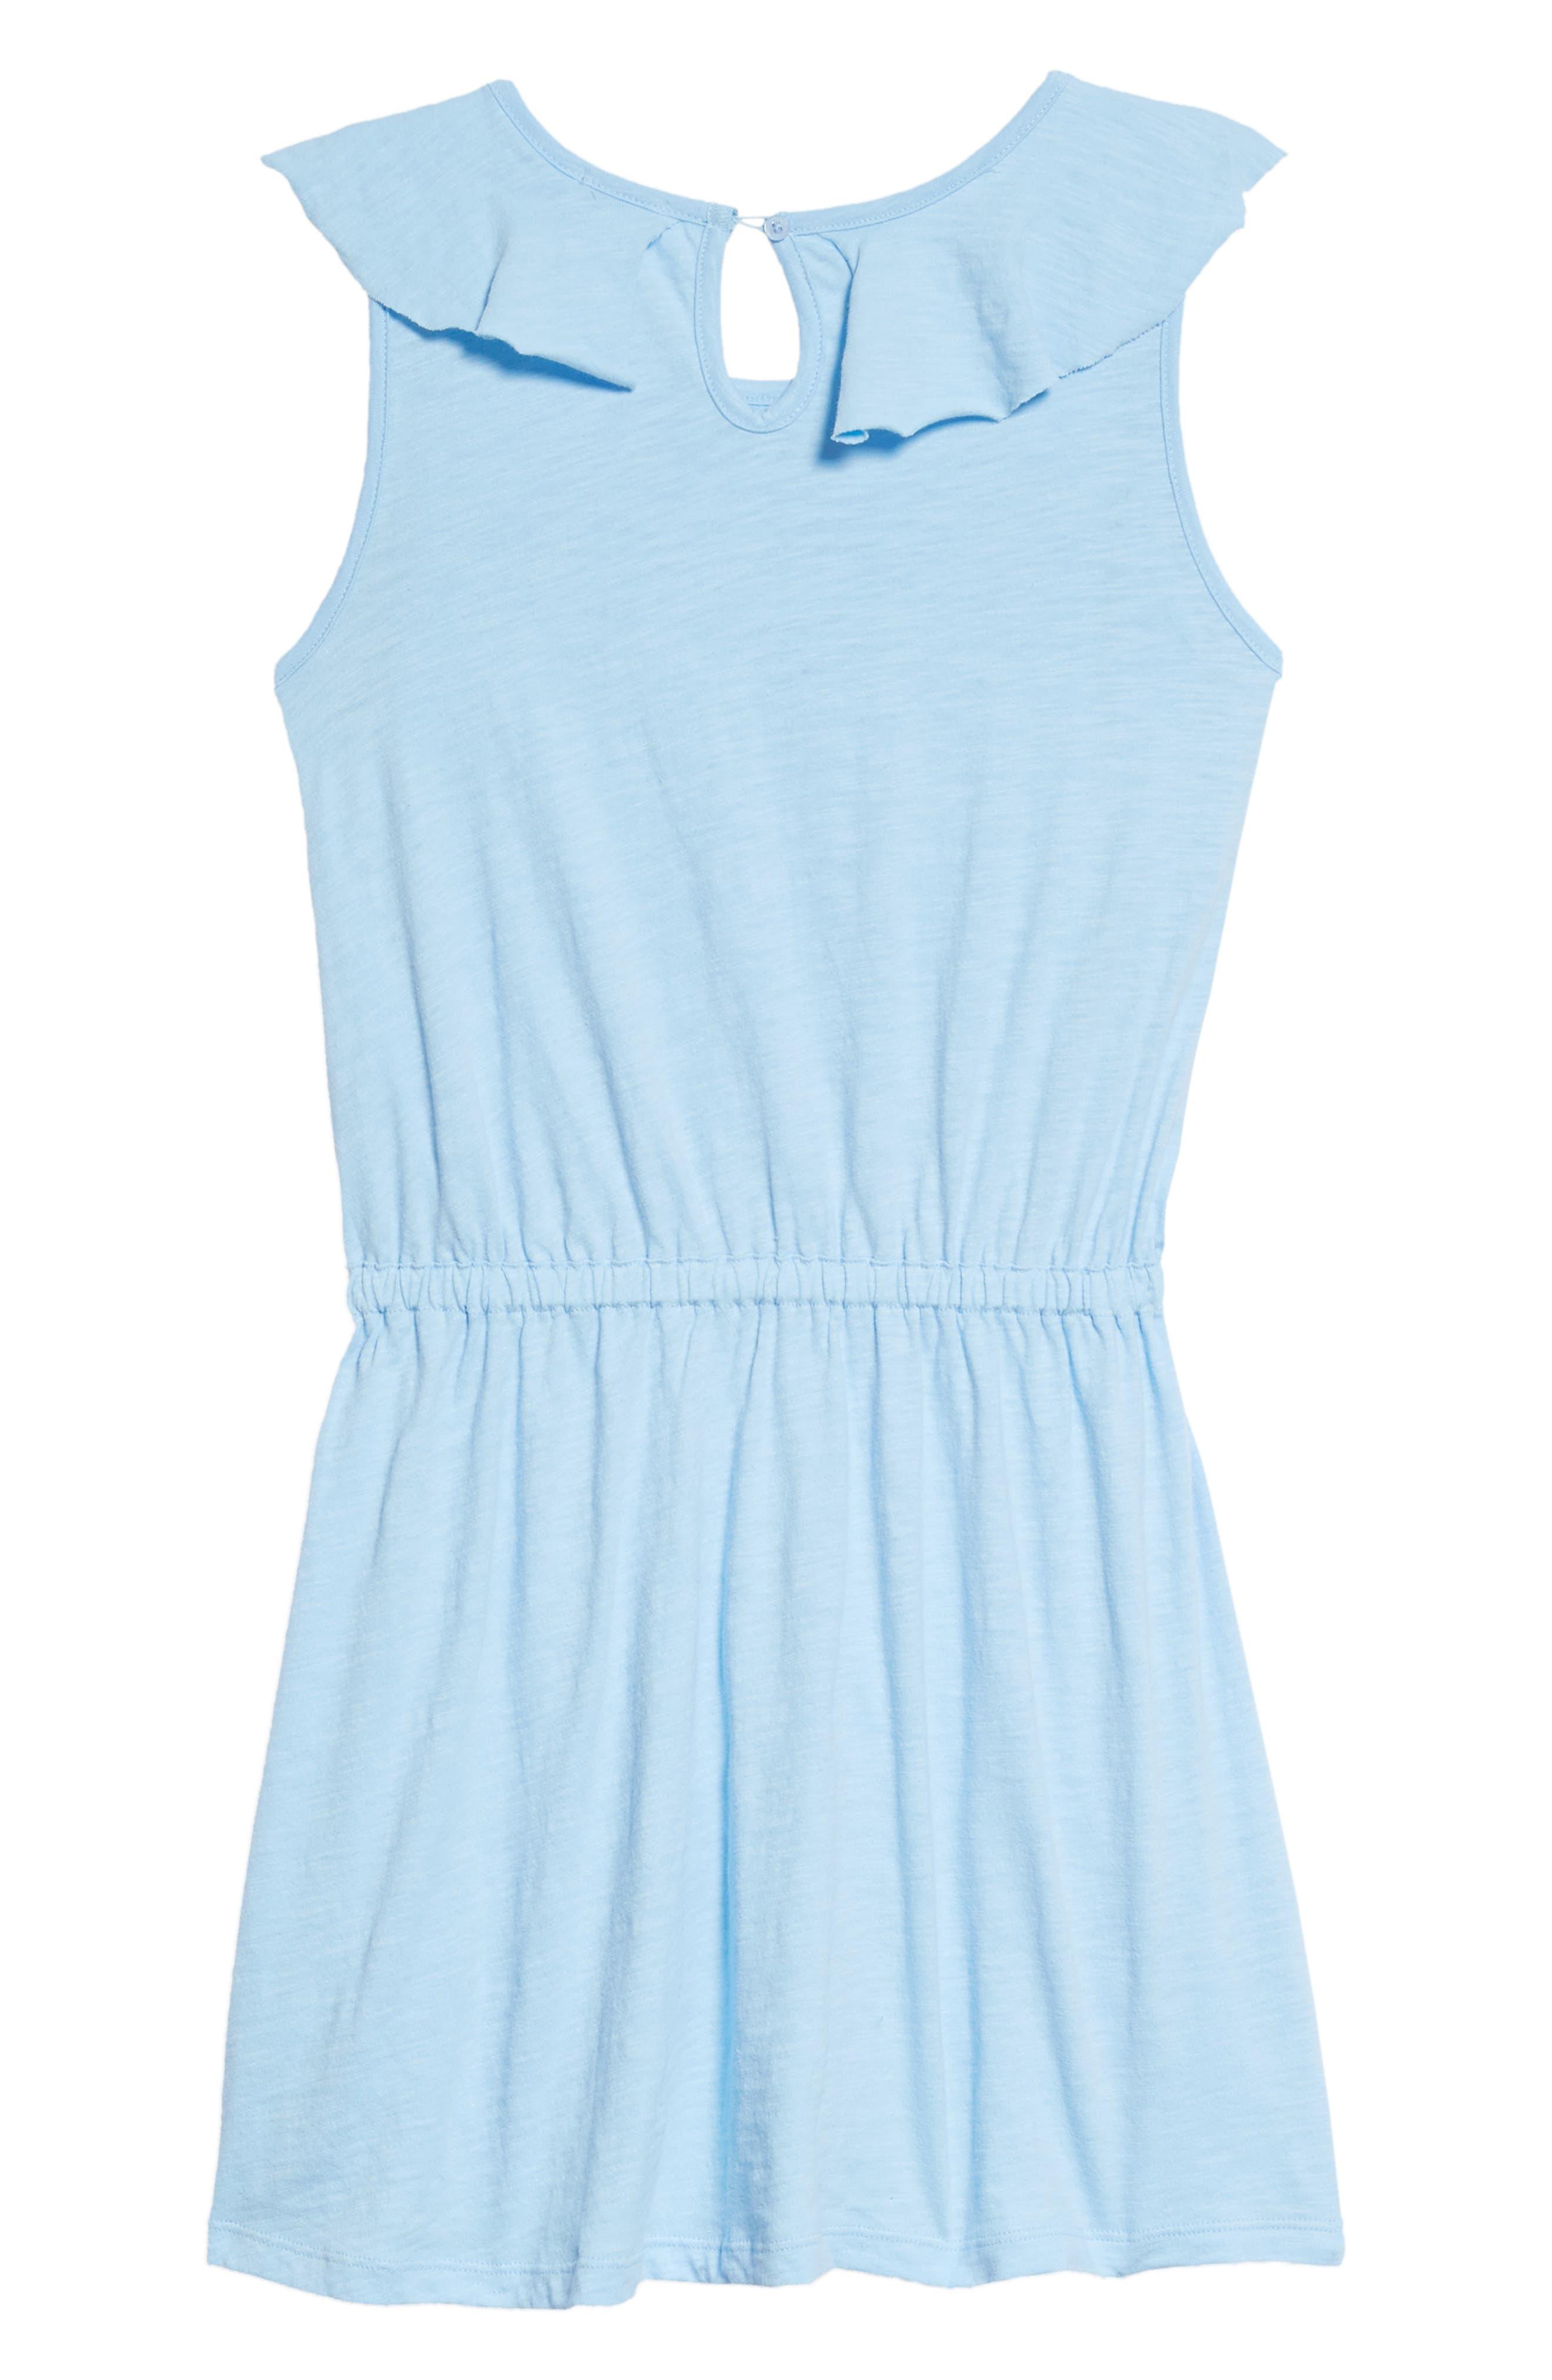 Flounce Dress,                             Alternate thumbnail 2, color,                             Blue Bell